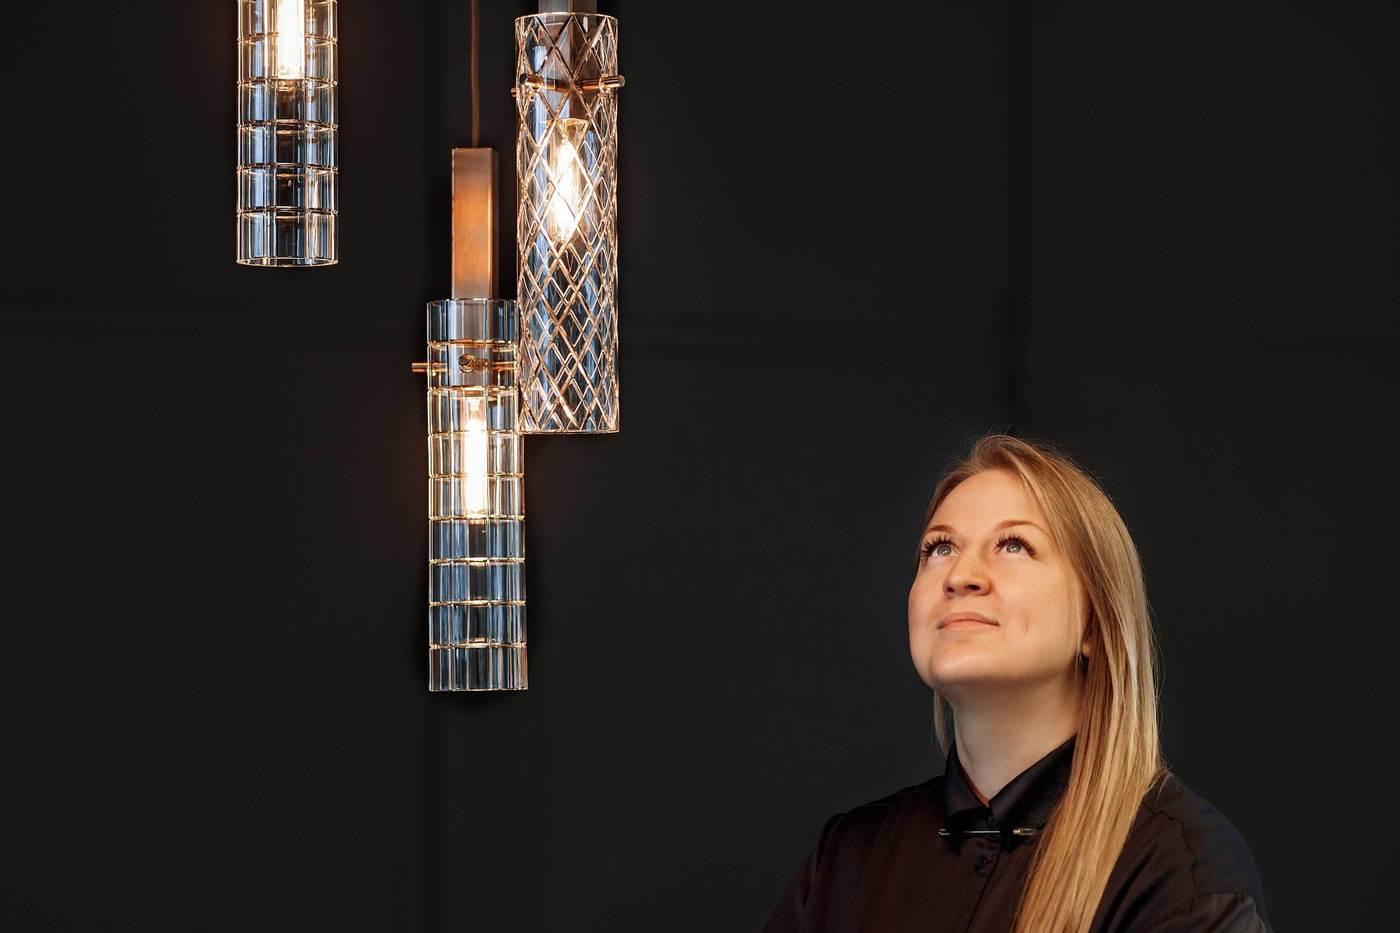 The best Russian product designer, Ekaterina Elizarova and her Geometric pendants by Preciosa